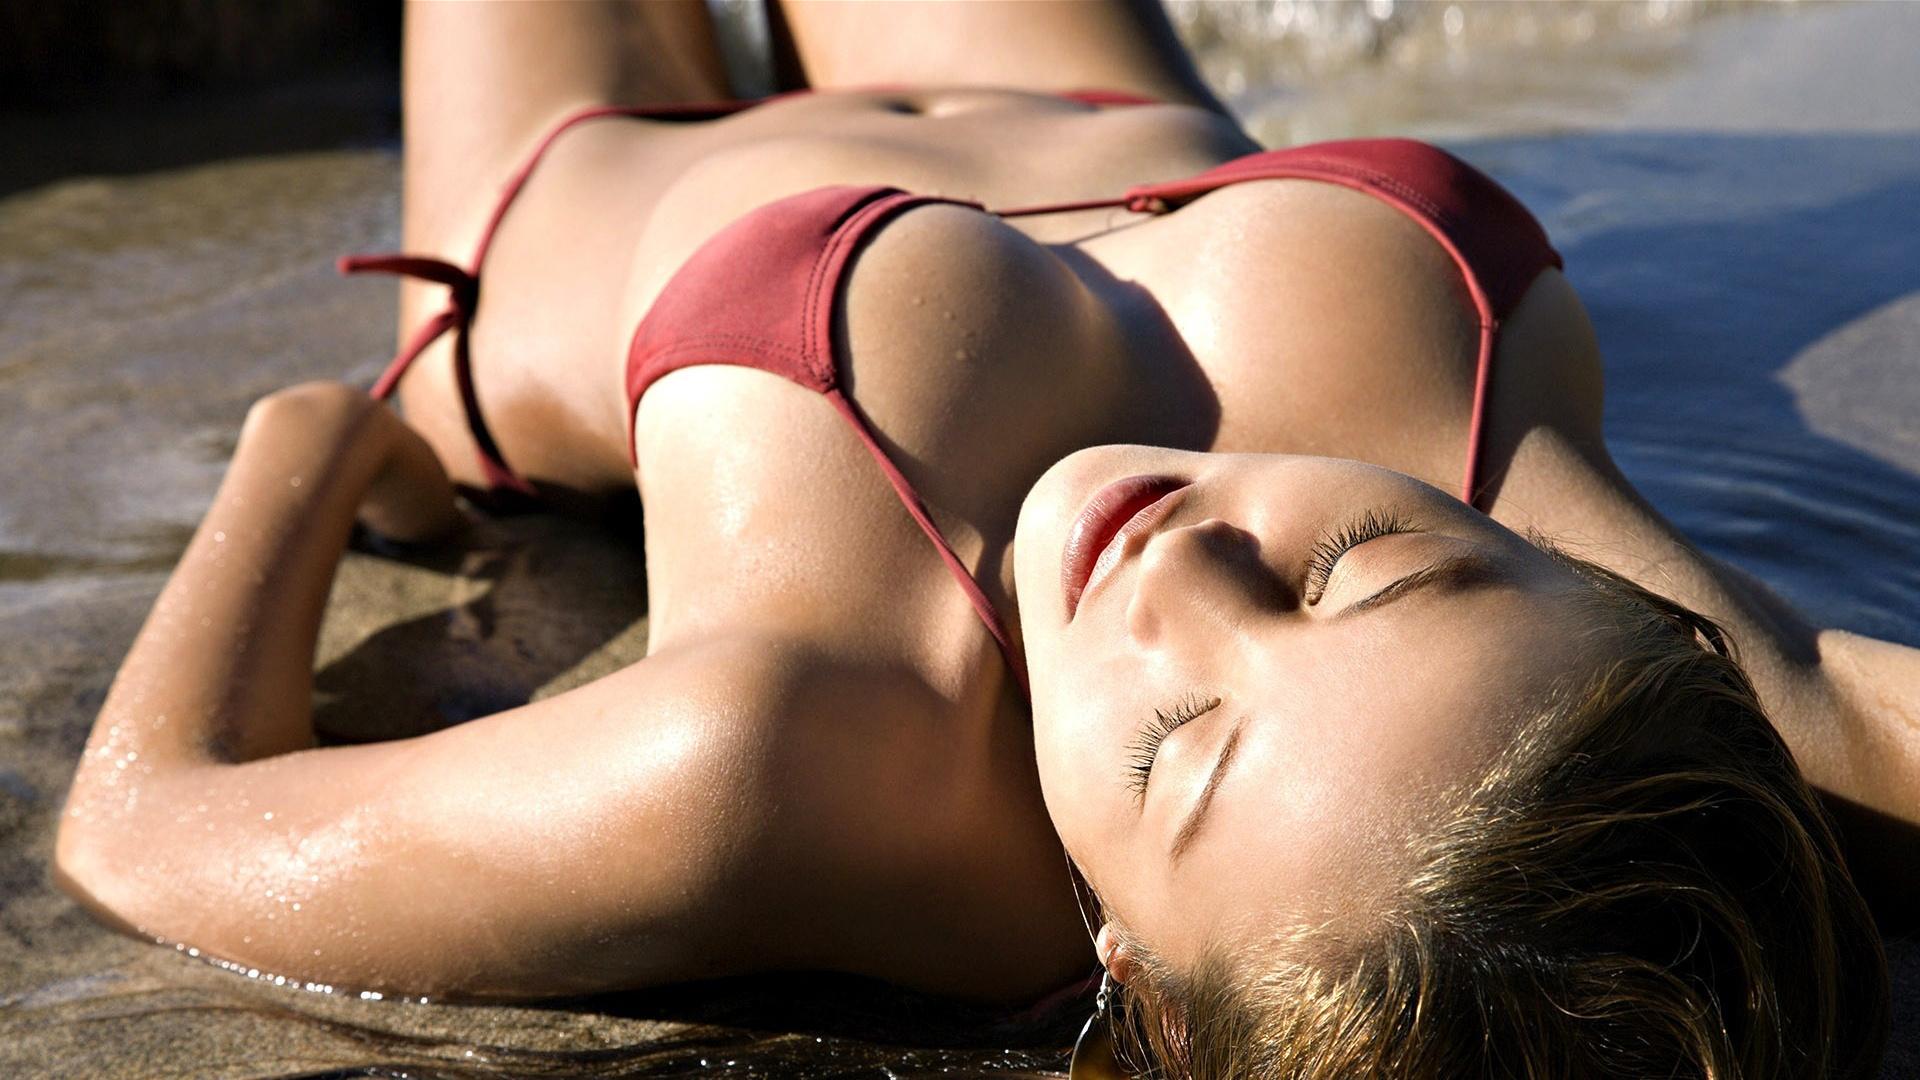 luchshie-seks-video-hd